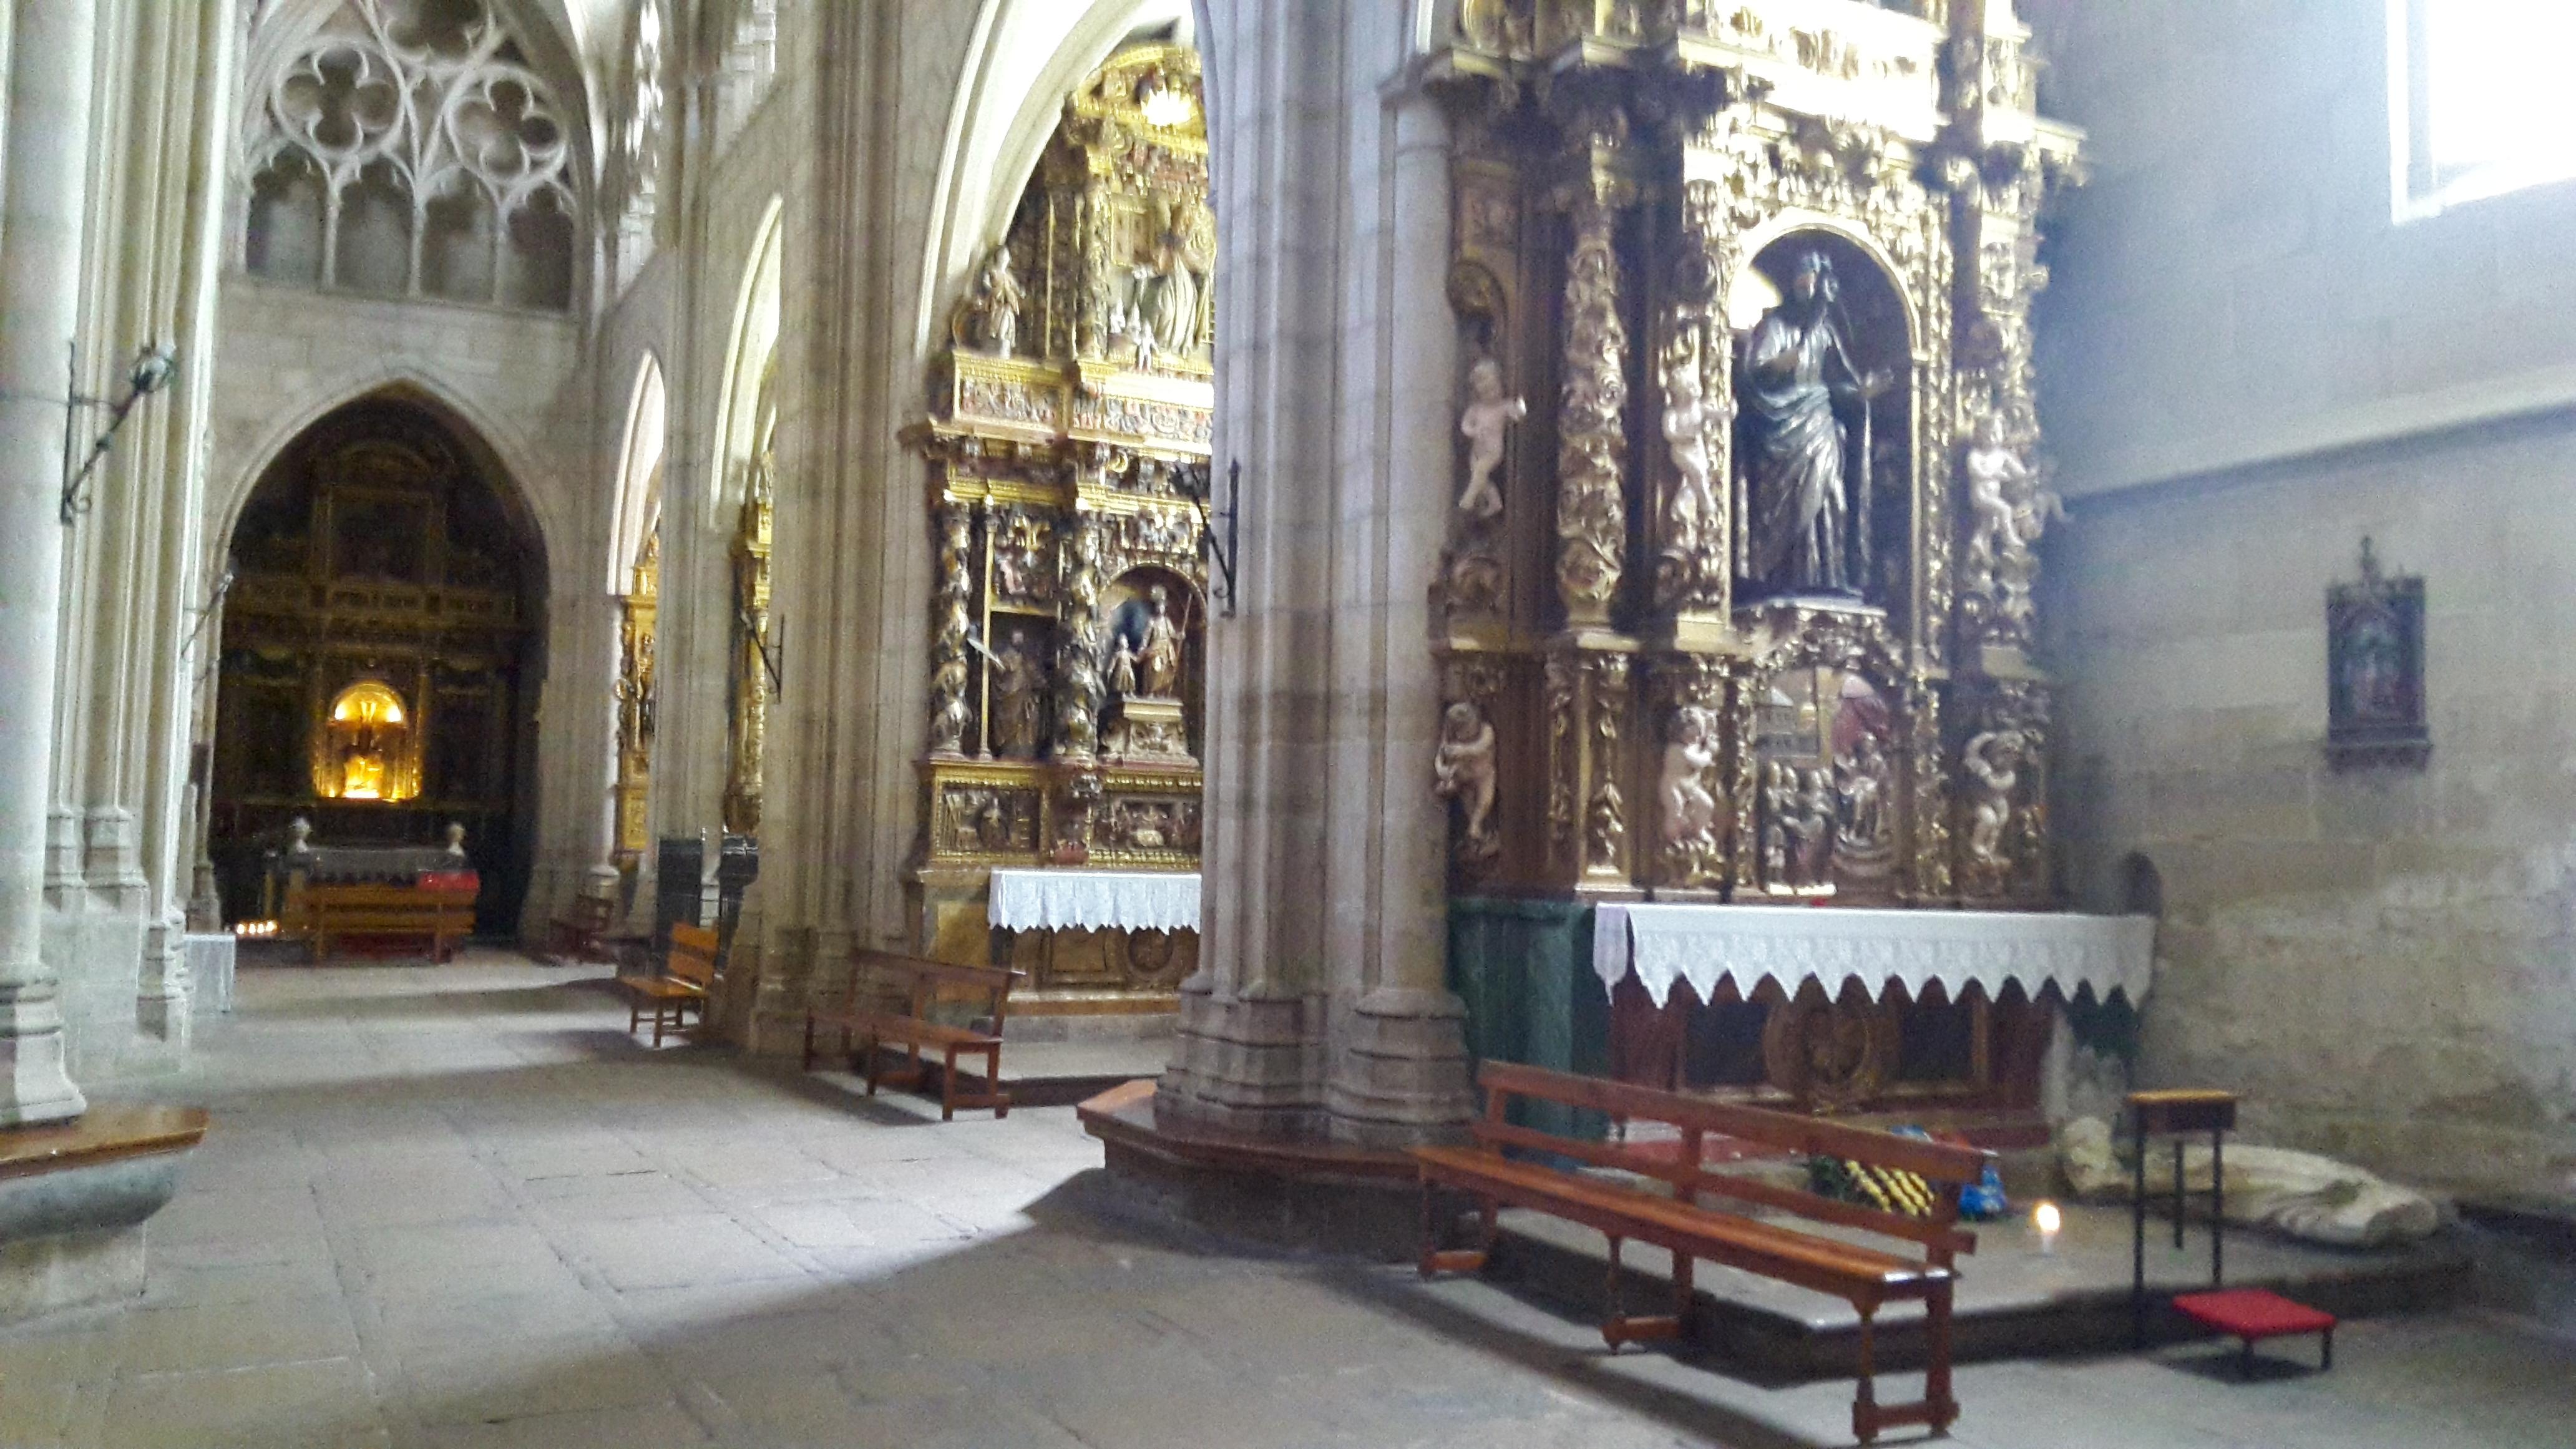 Viana Iglesia Santa Maria. A templom belülről.